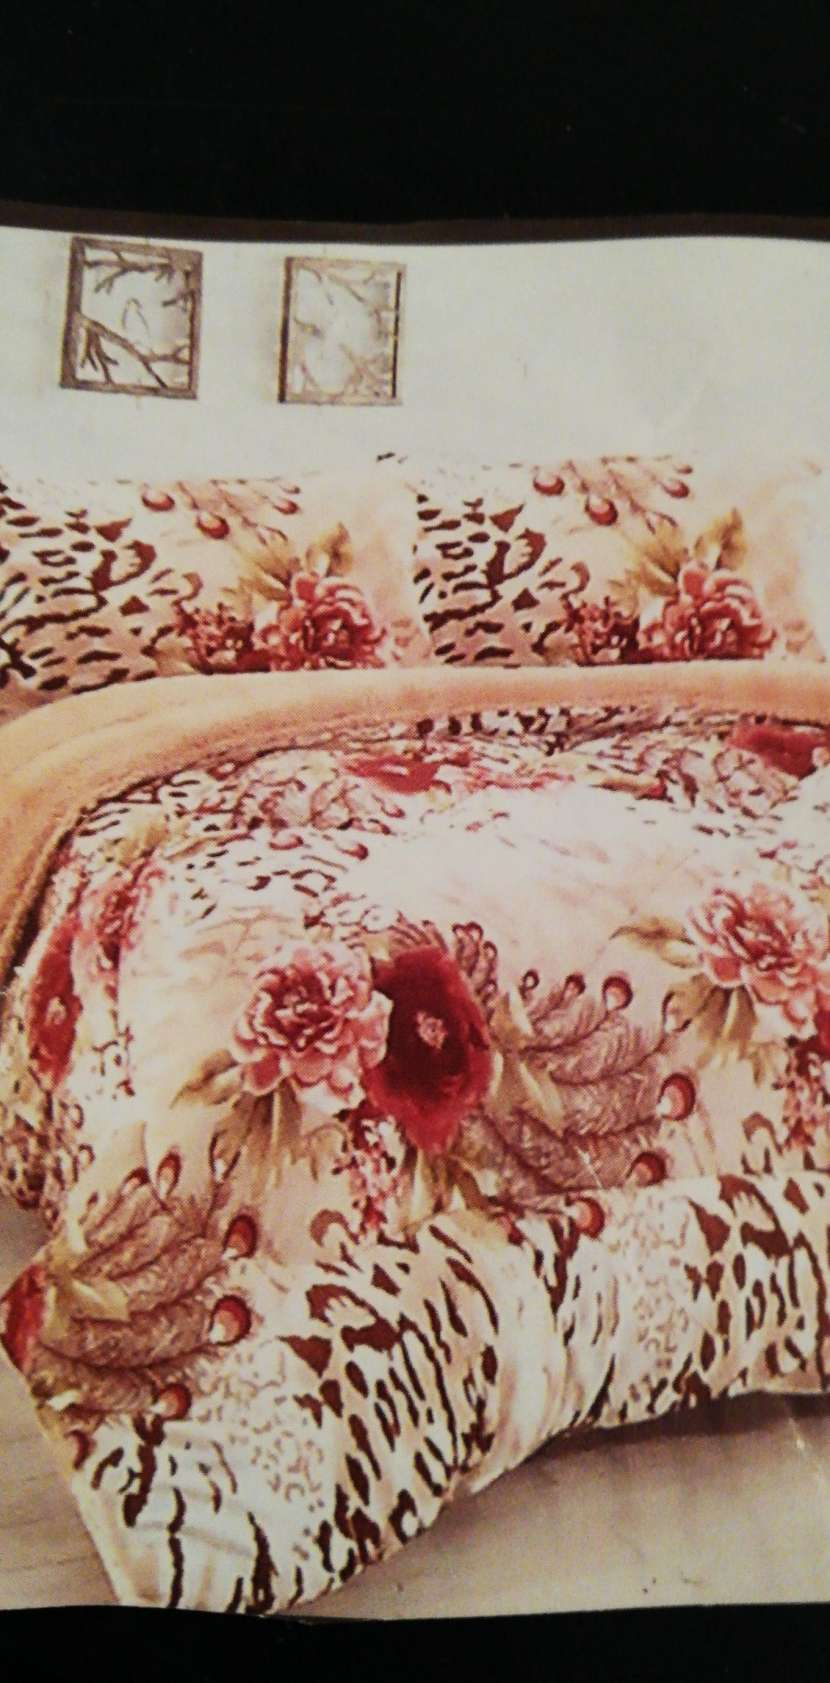 Edredón anti alérgico con corderito y fundas